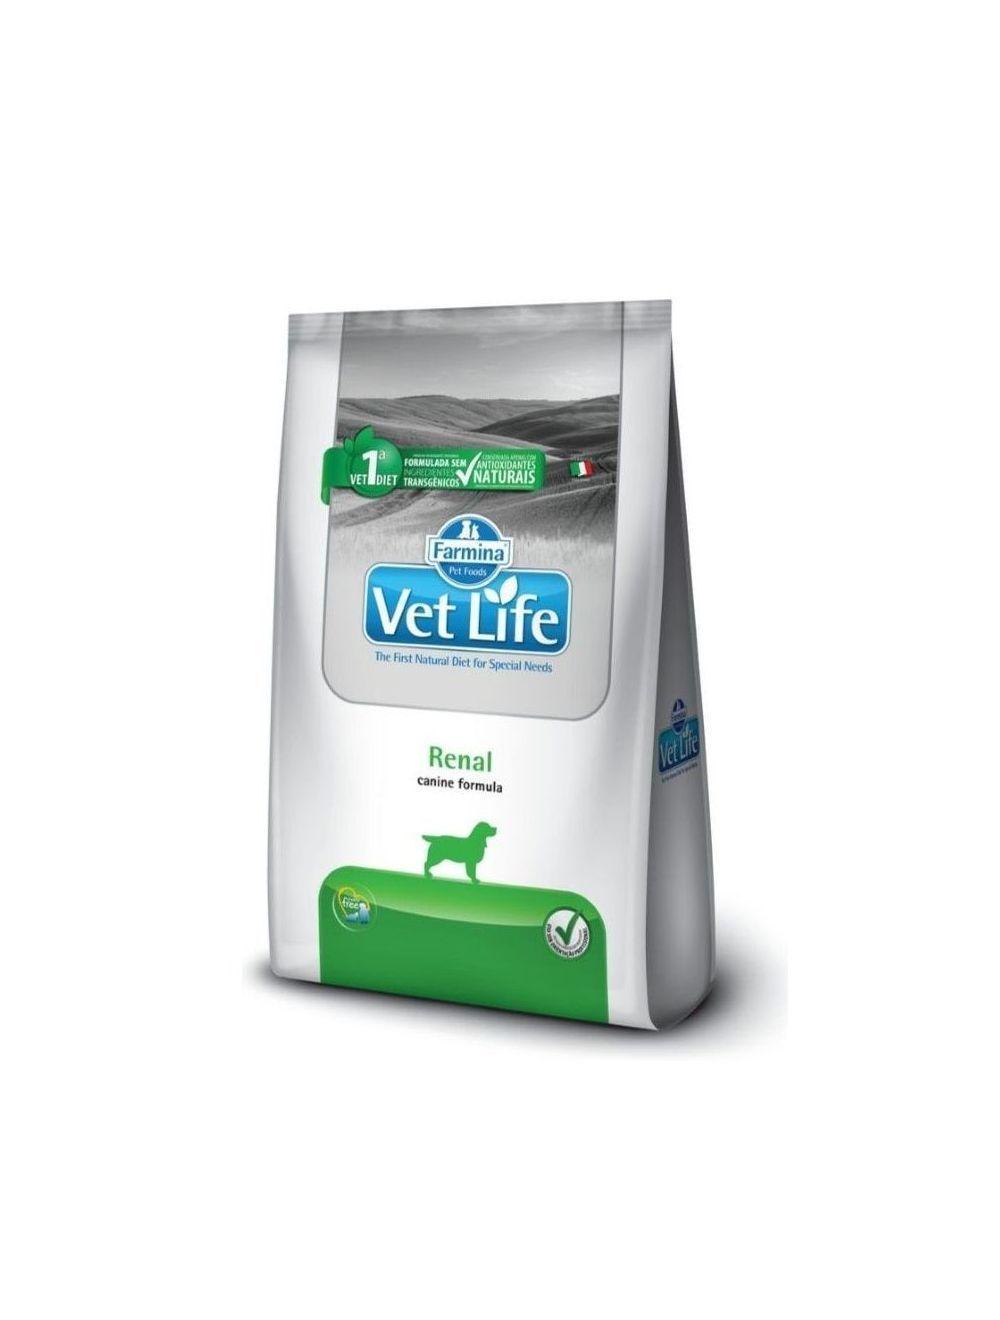 Comida para perro Vet Life Renal 10.1 Kg - ciudaddemascotas.com